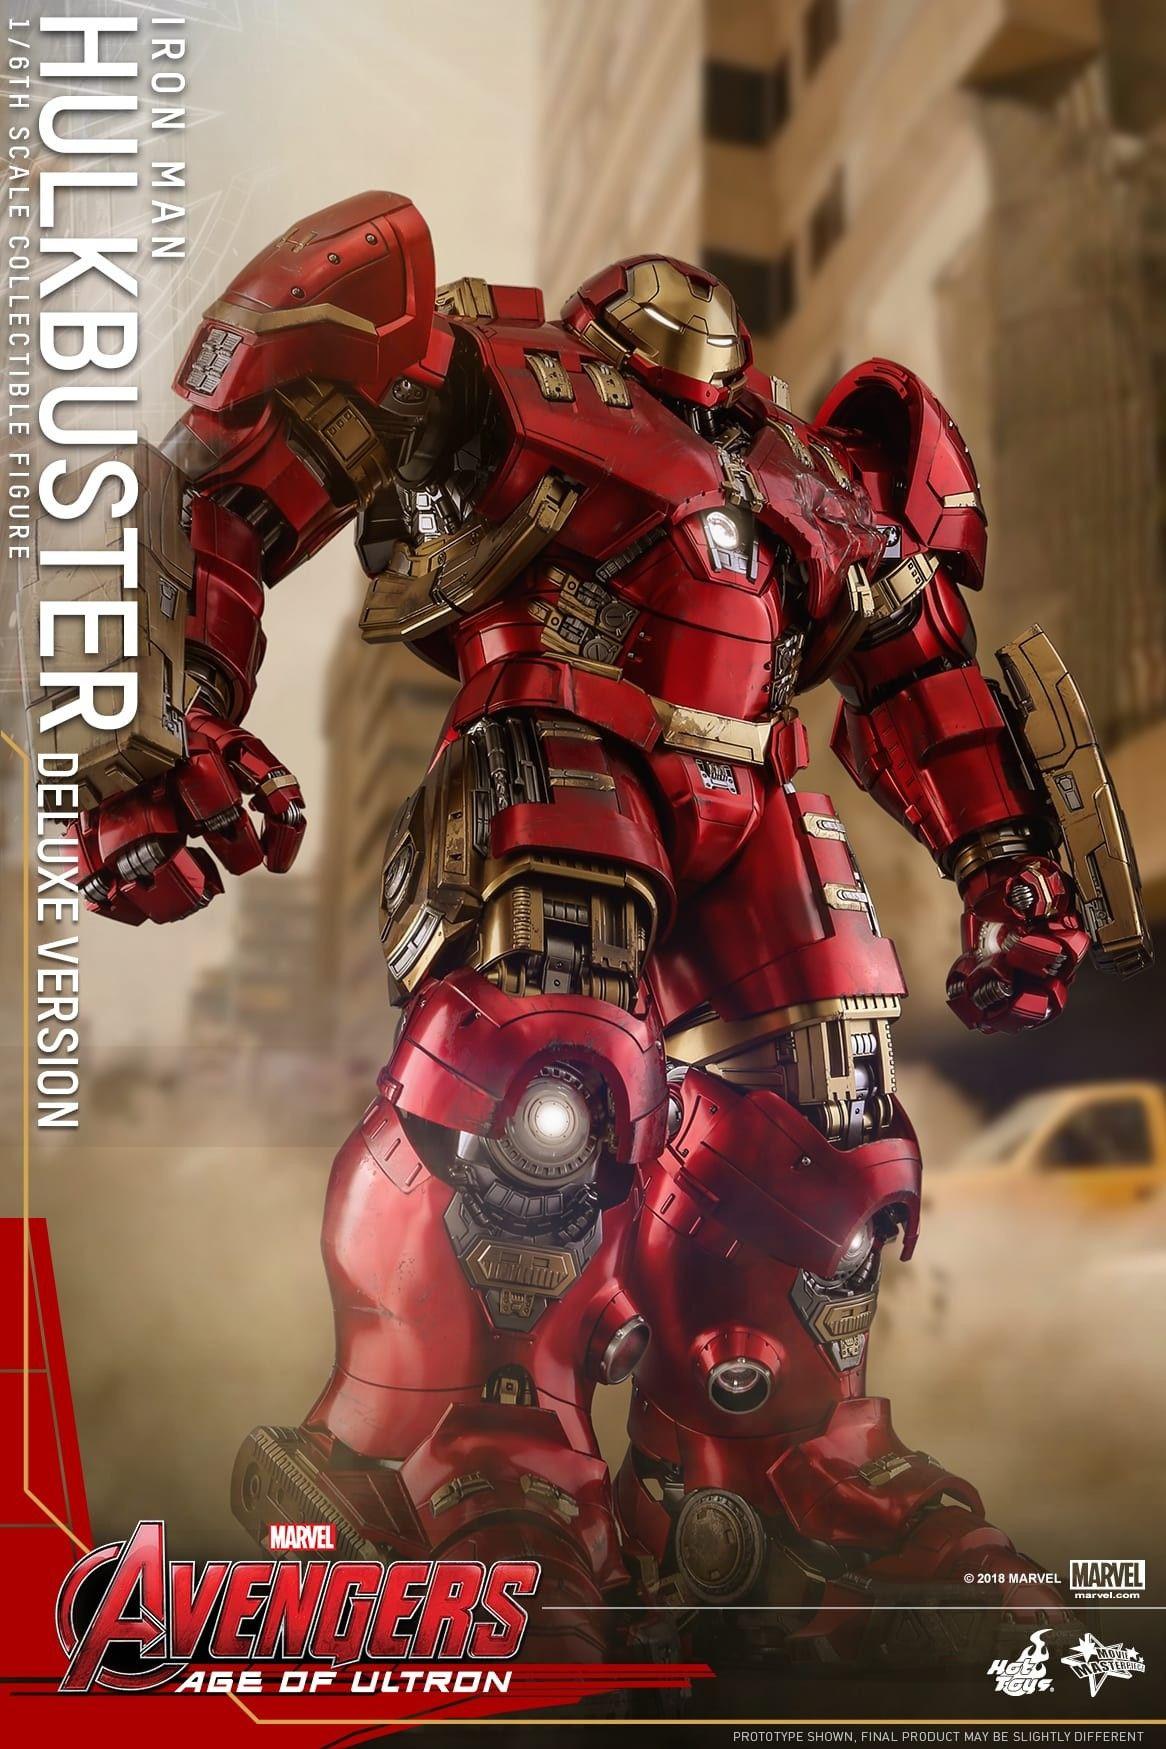 hulk buster toys marvel marvel ironman hilkbuster hulk hd 4k